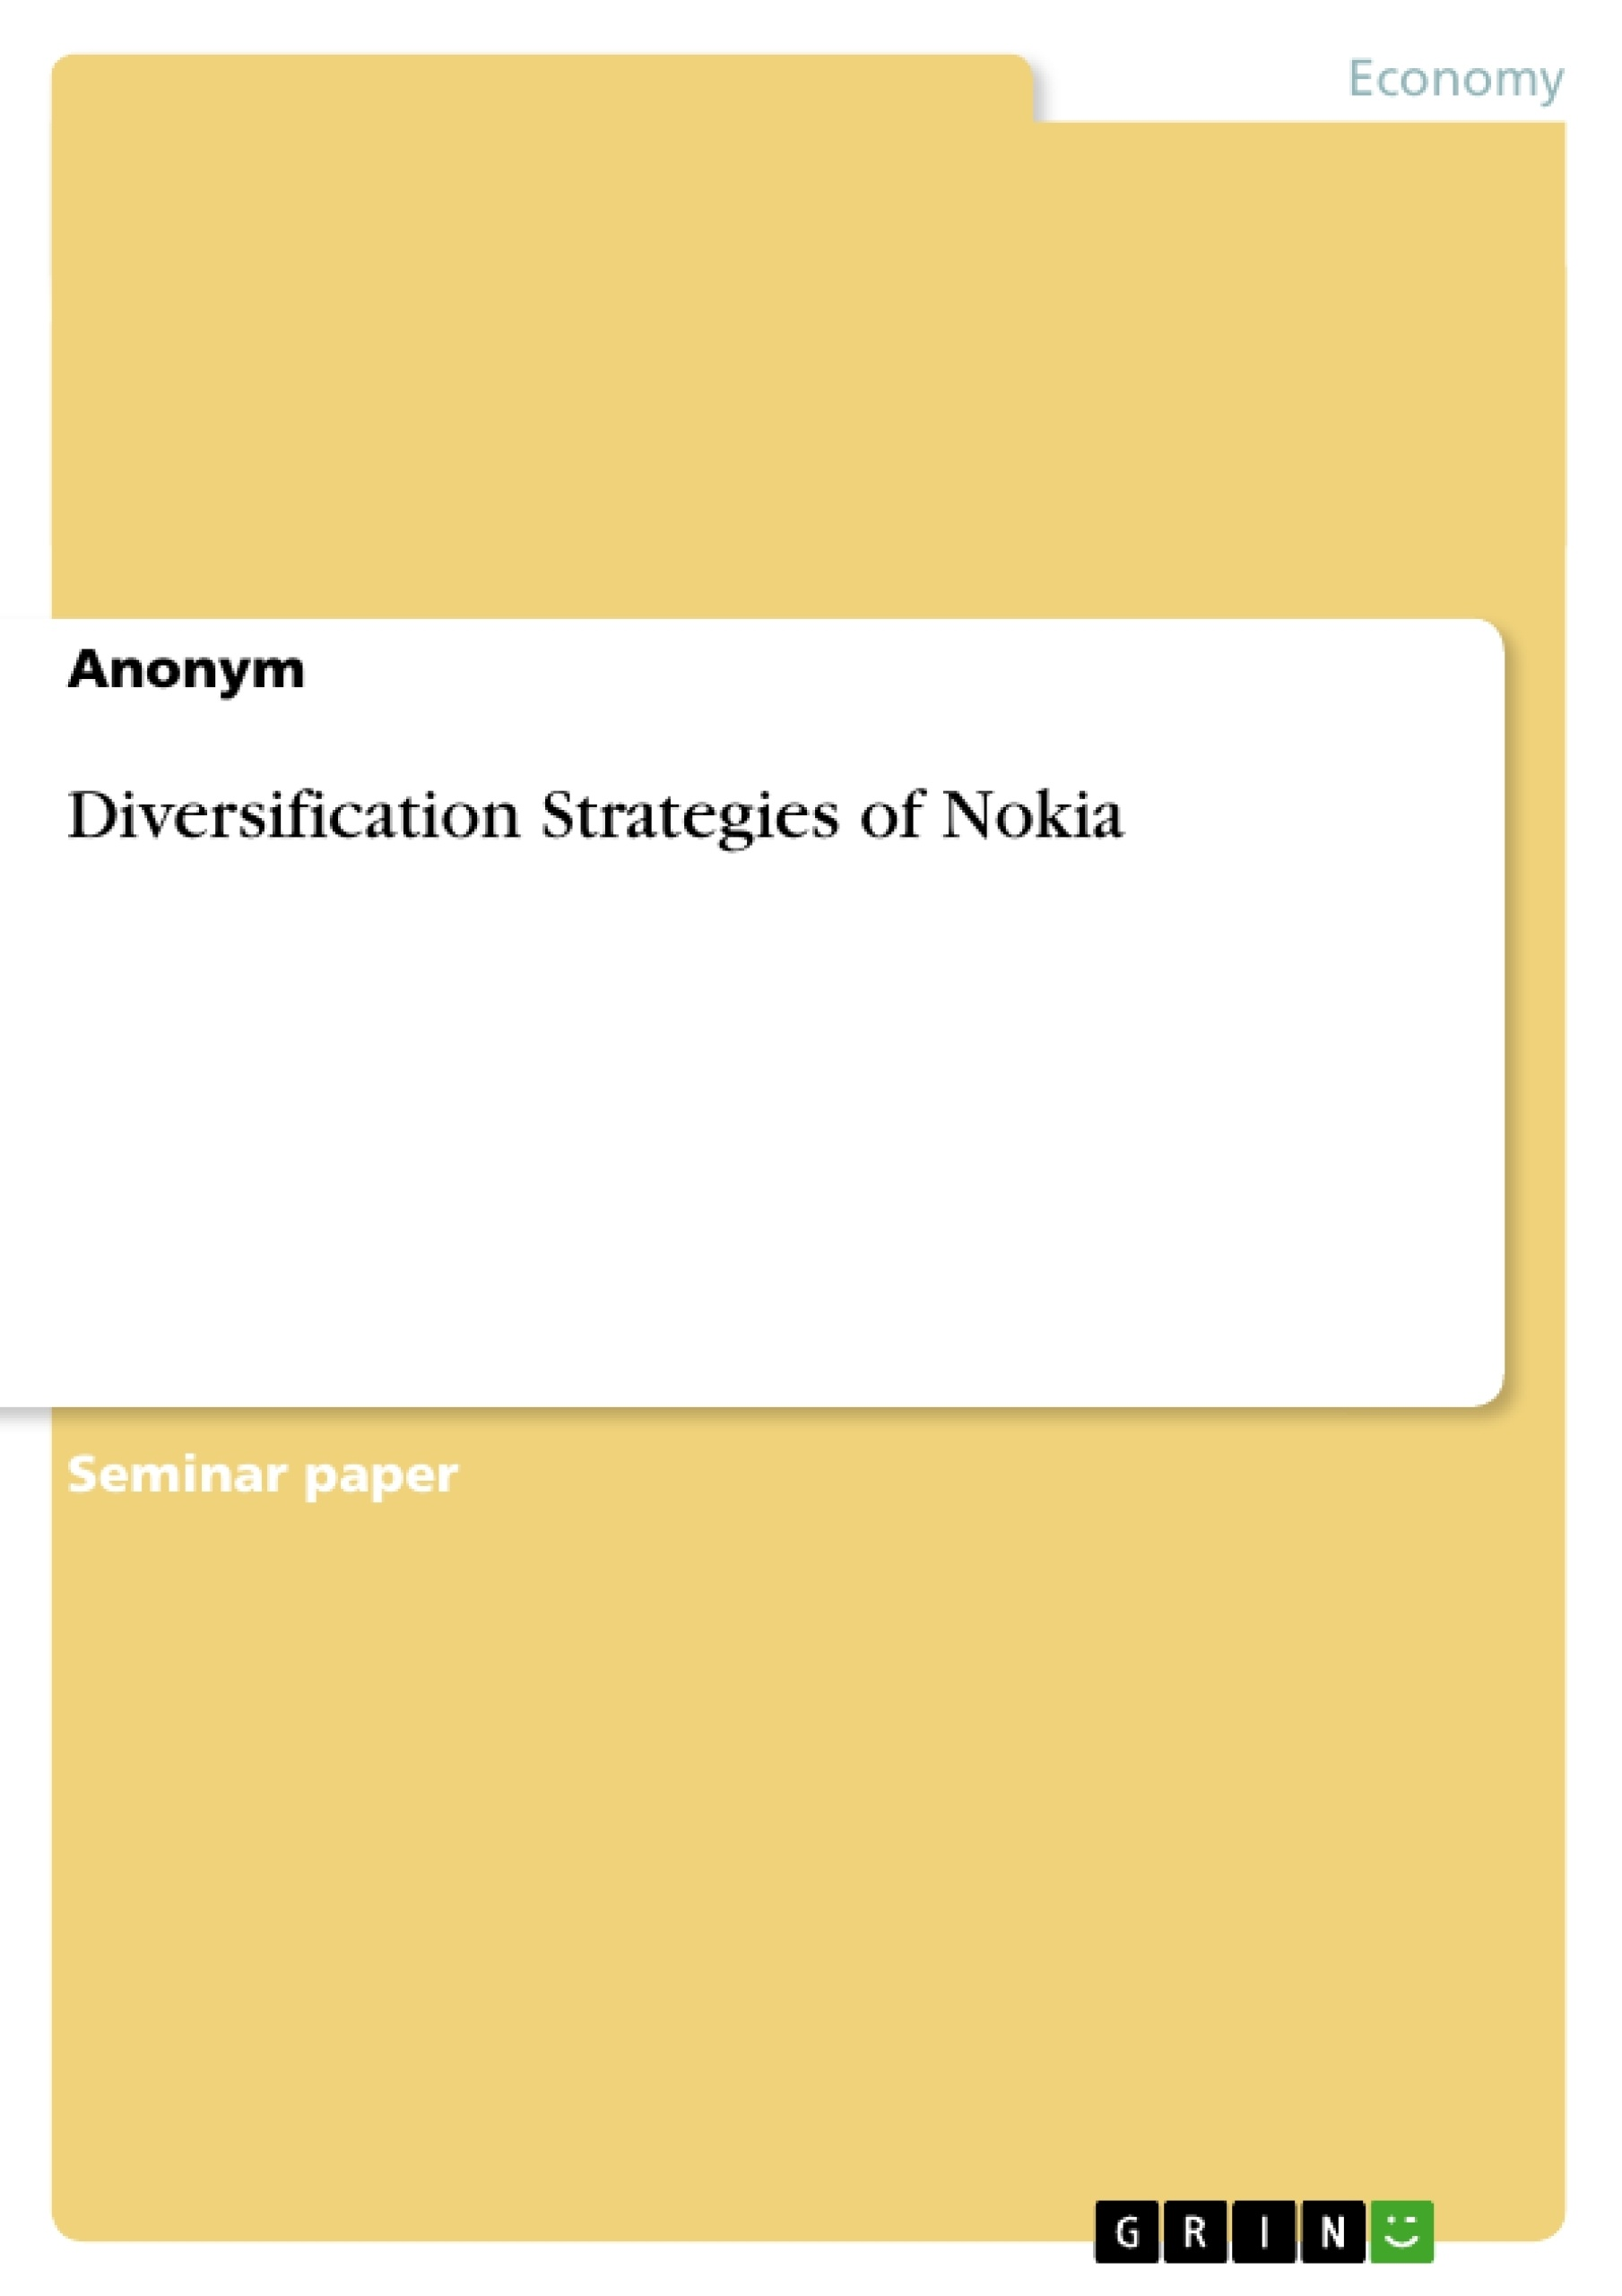 International portfolio diversification research papers